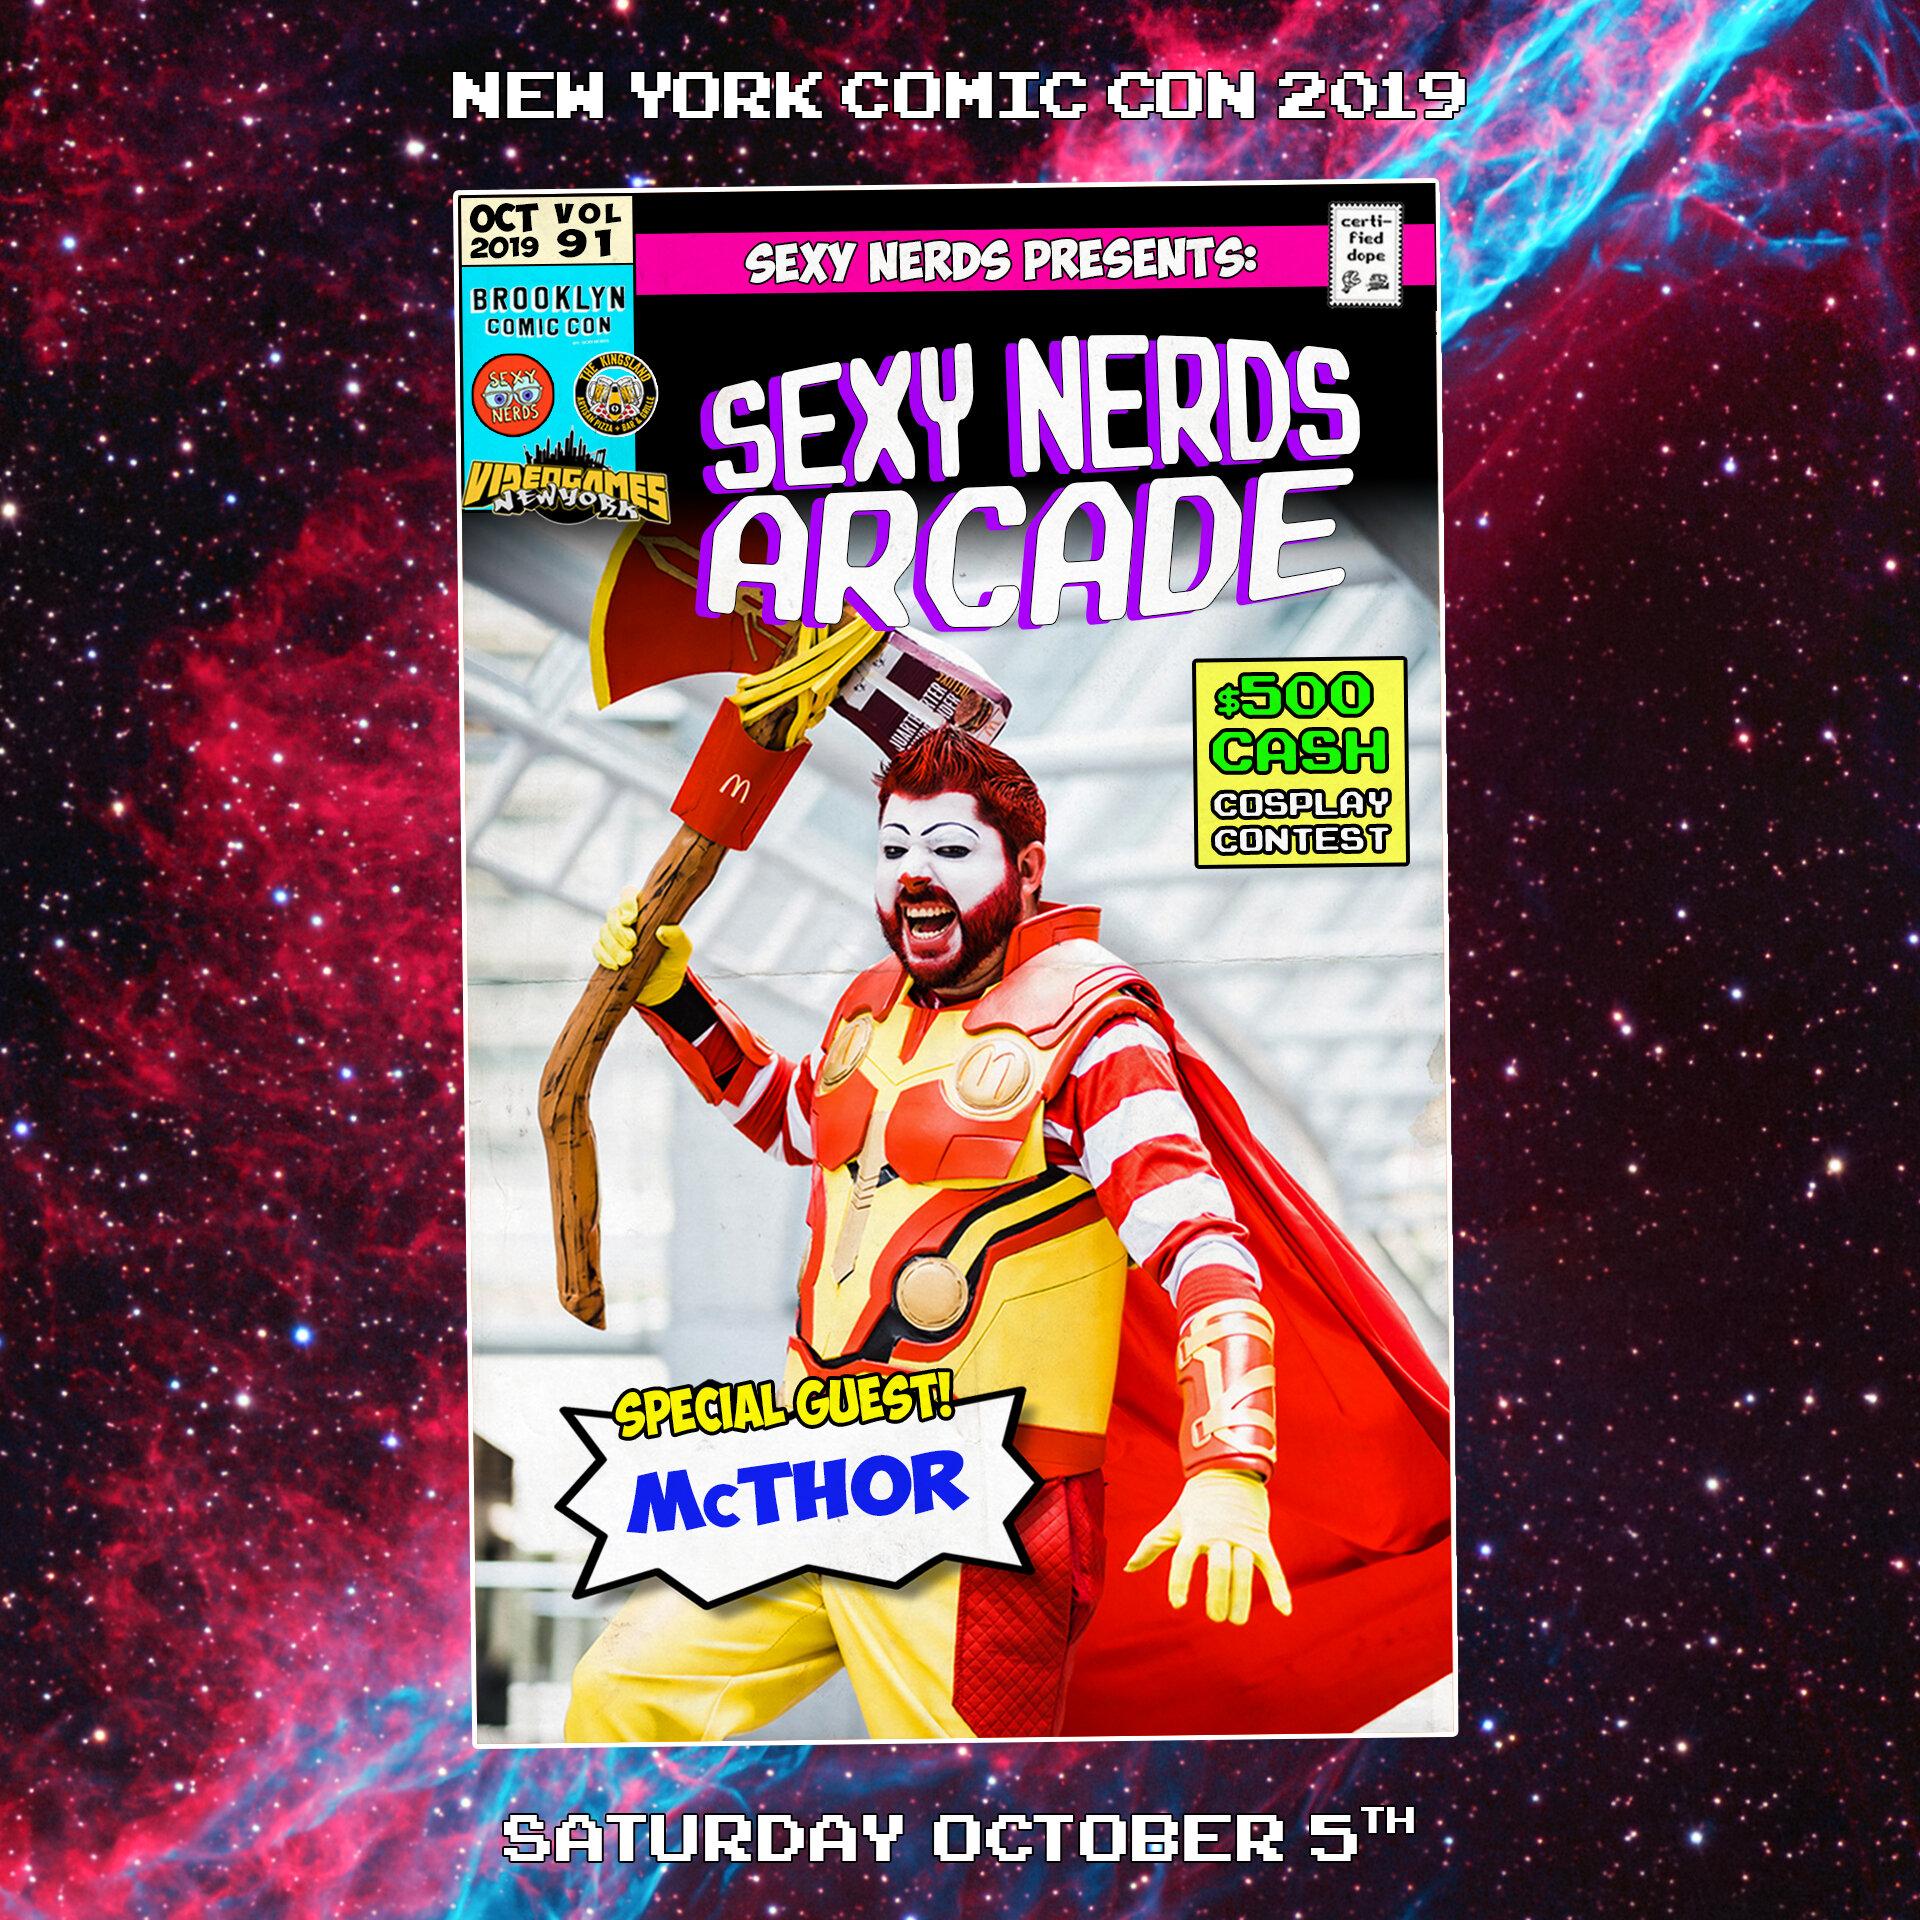 2019 NYCC Cosplay Comic Book mcthor square.jpg